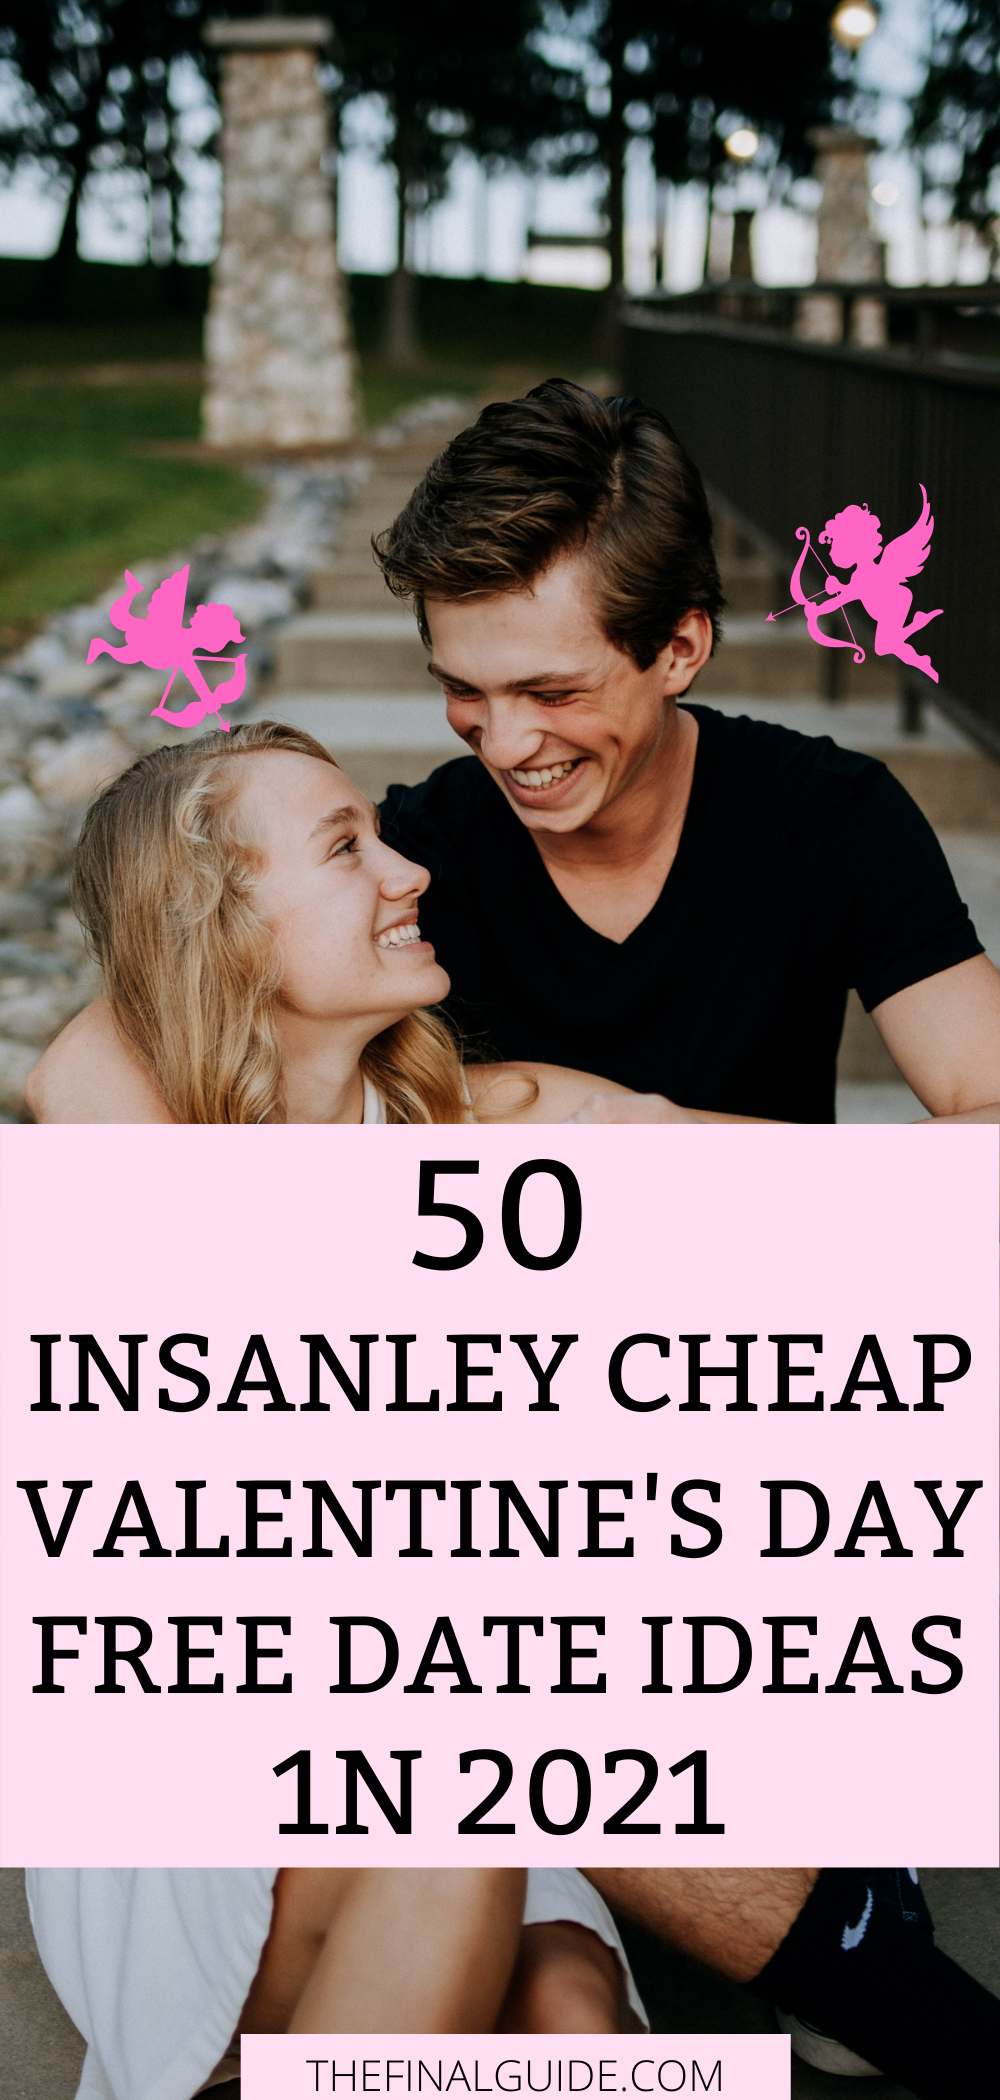 50 Insanley Cheap Valentine S Day Free Date Ideas In 2021 In 2021 Cheap Valentine Day Date Ideas Free Date Ideas